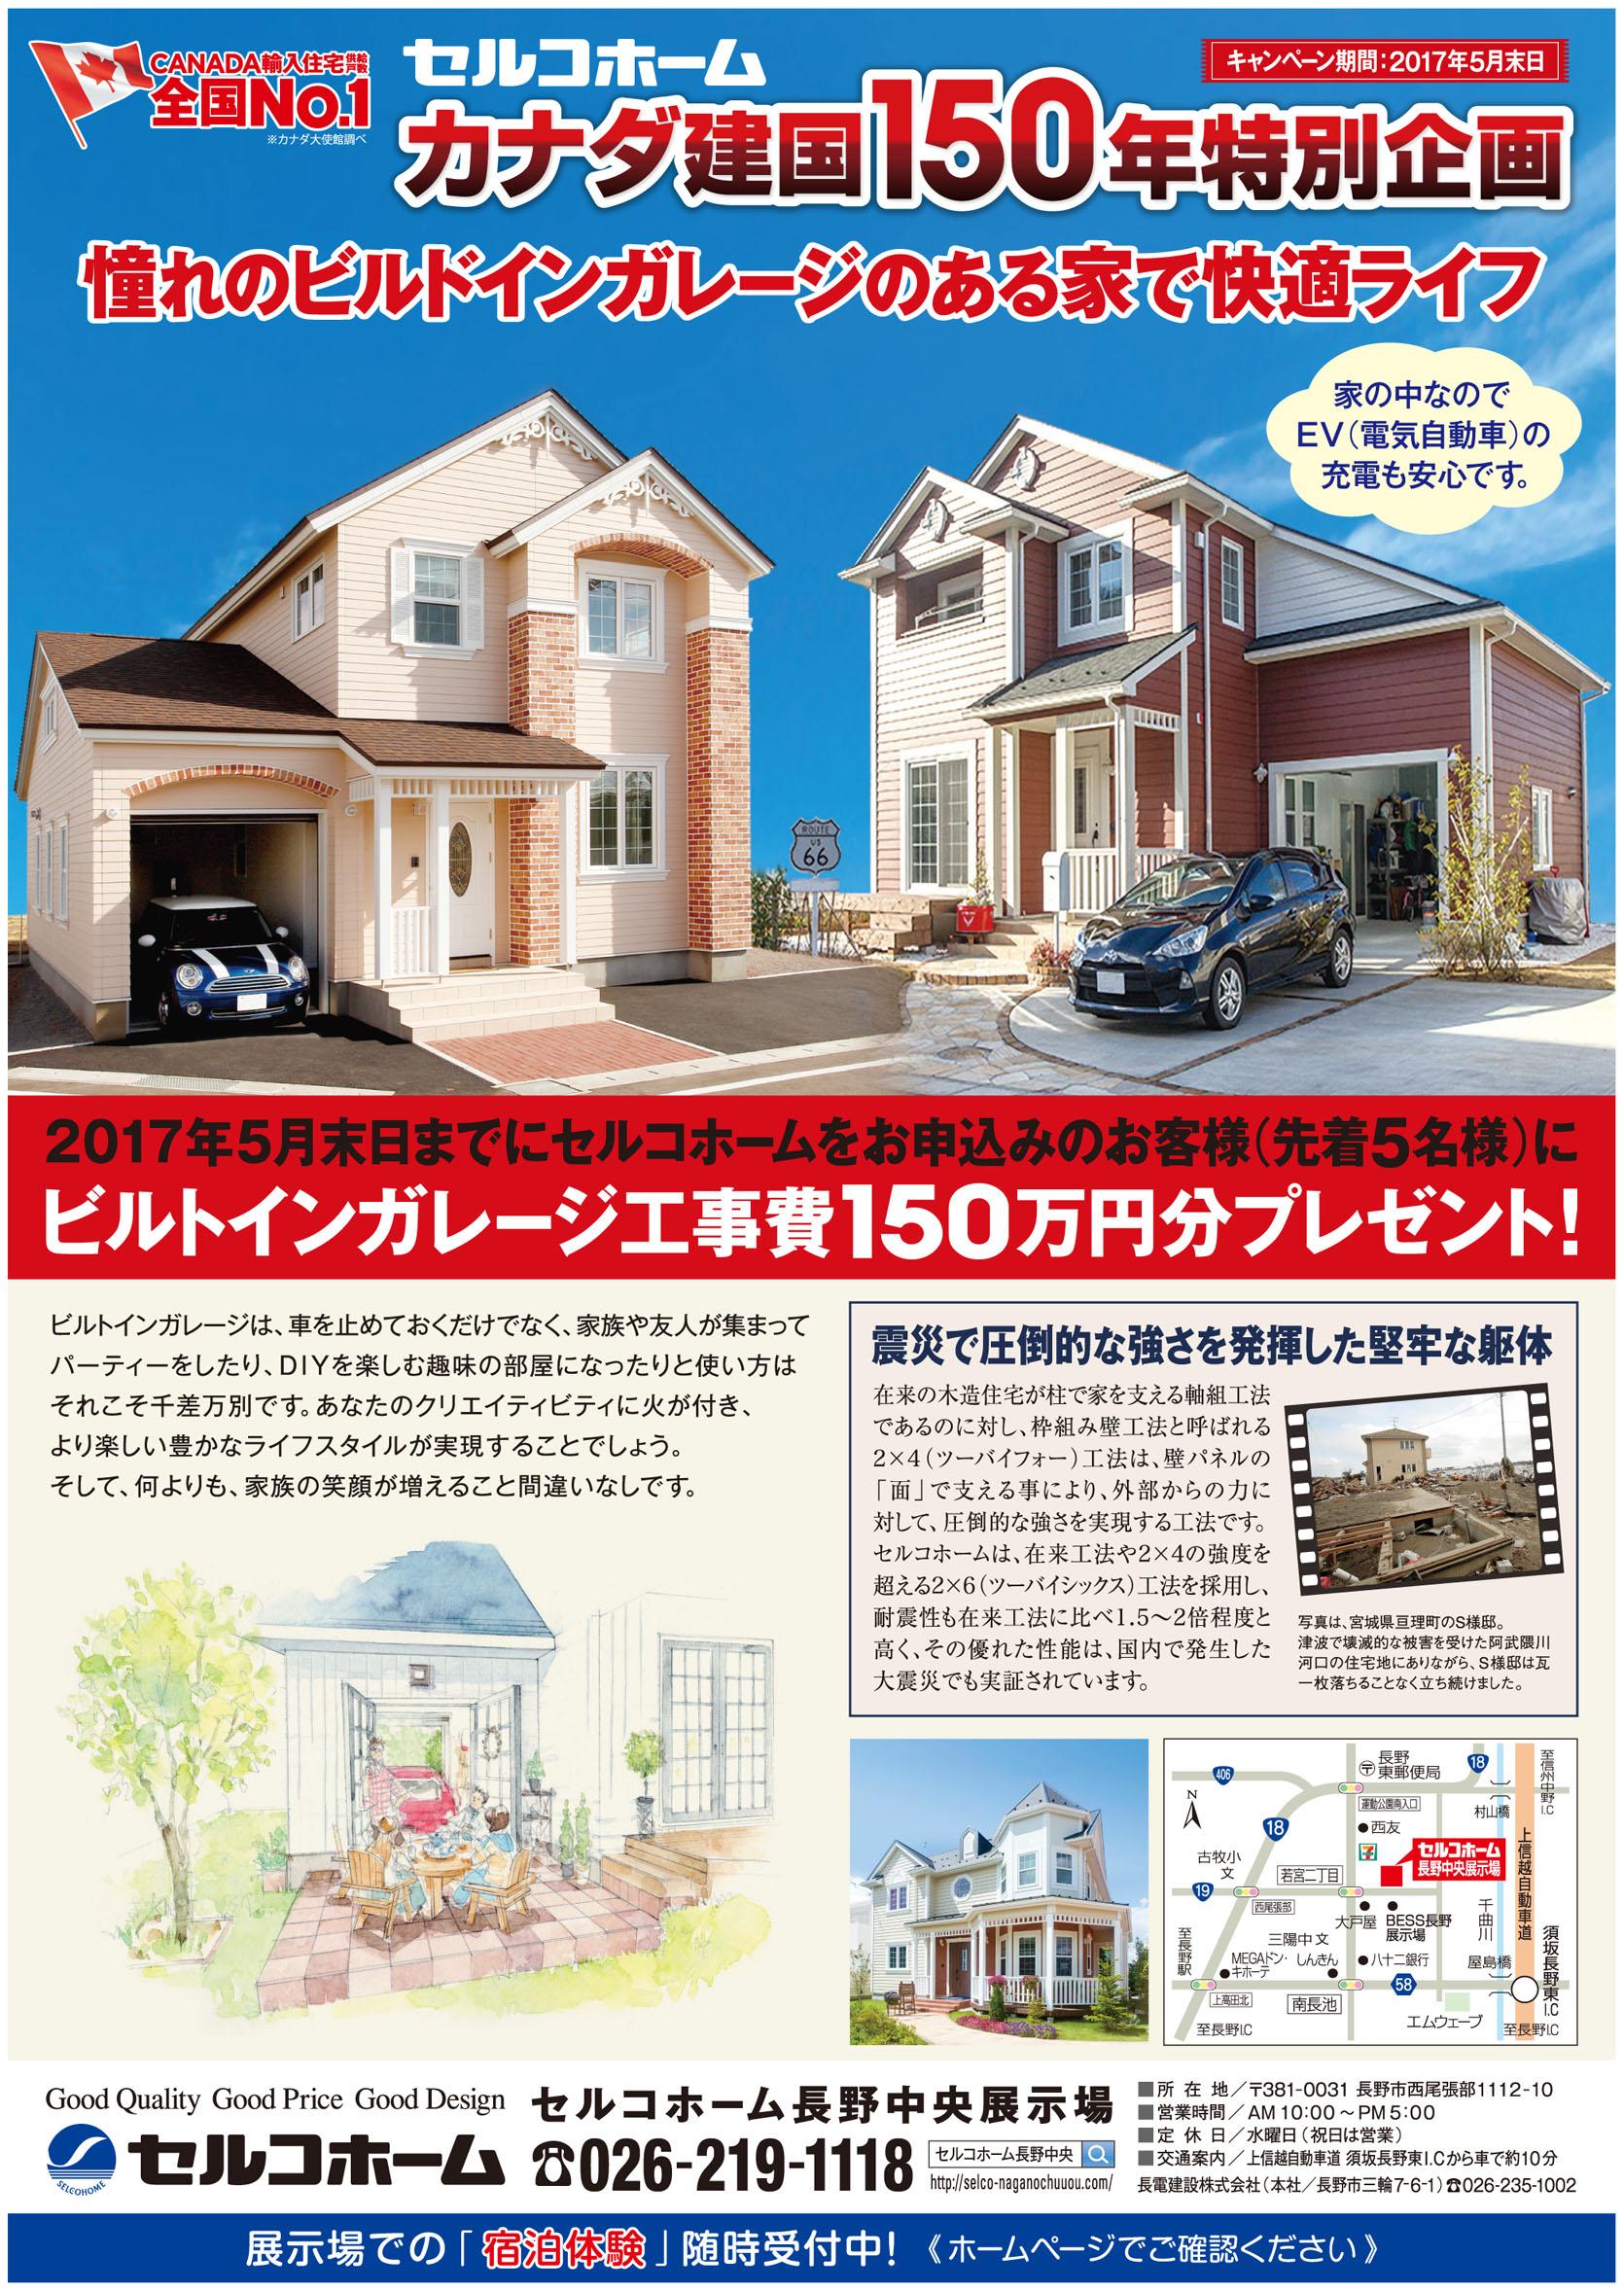 It is seruko _ built-in garage CP.jpg 29.03